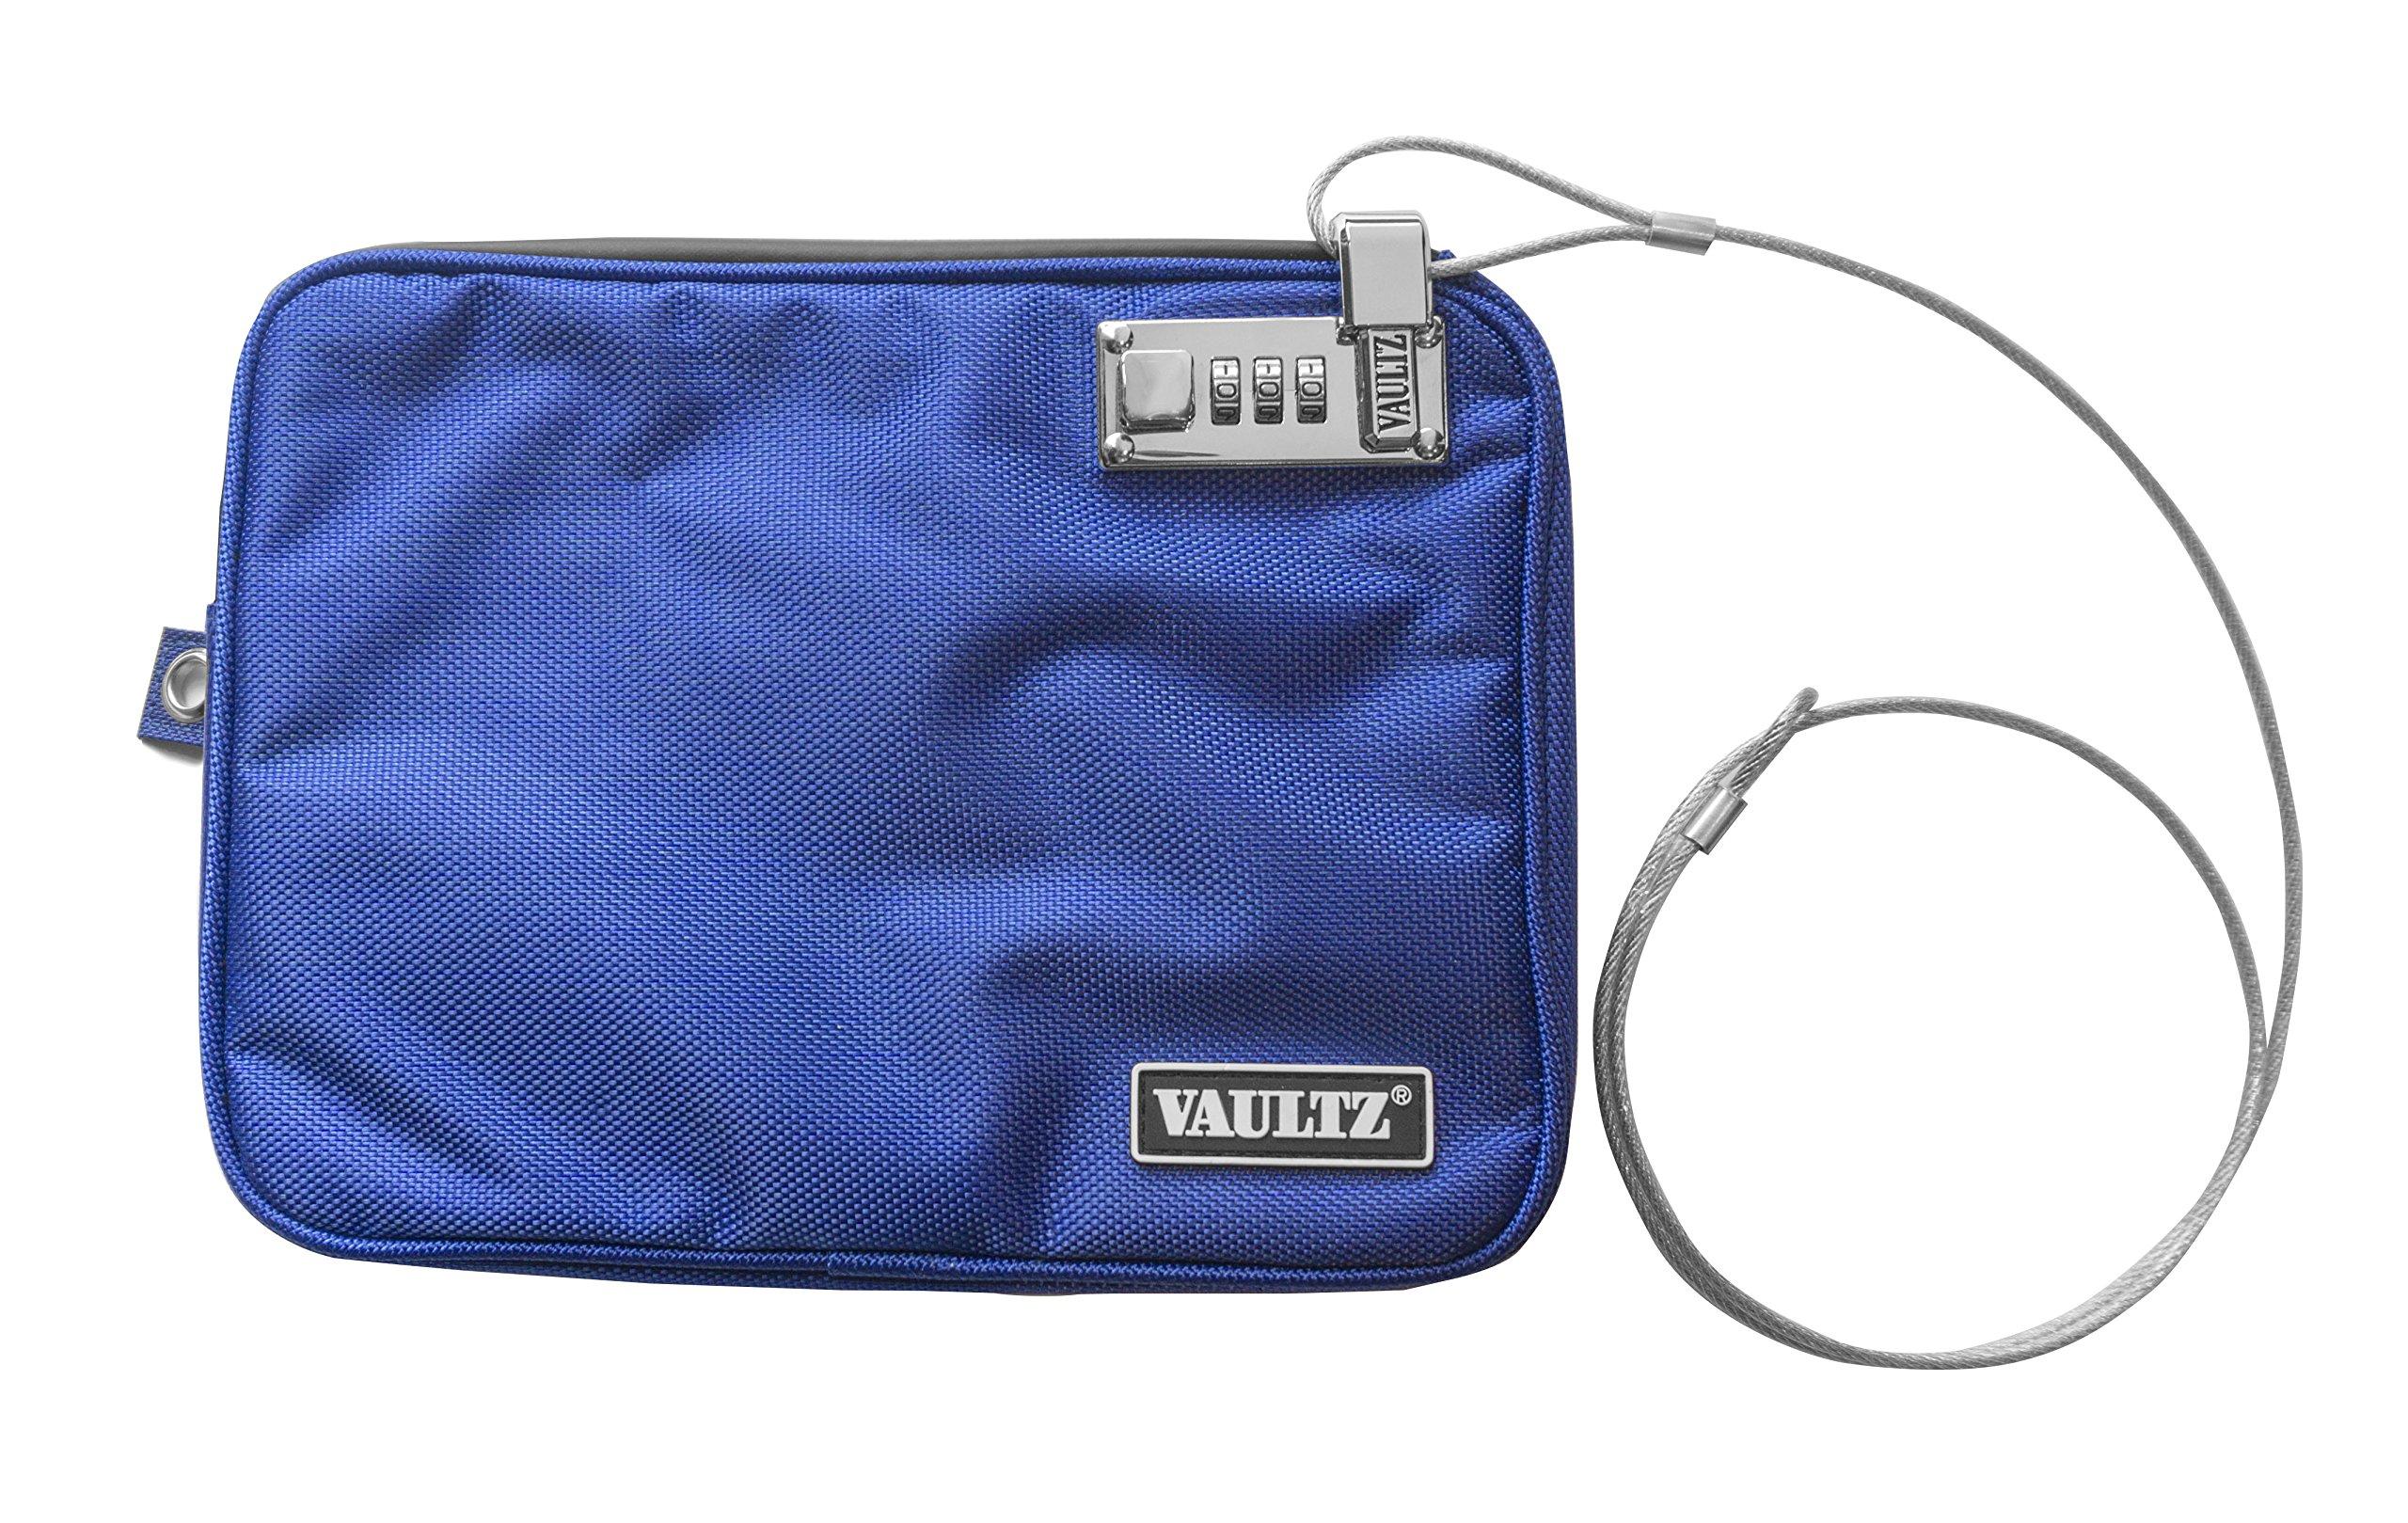 Vaultz Locking Pool Pouch with Tether, Medium, 7.5 x 9 Inches, Blue (VZ00724) by Vaultz